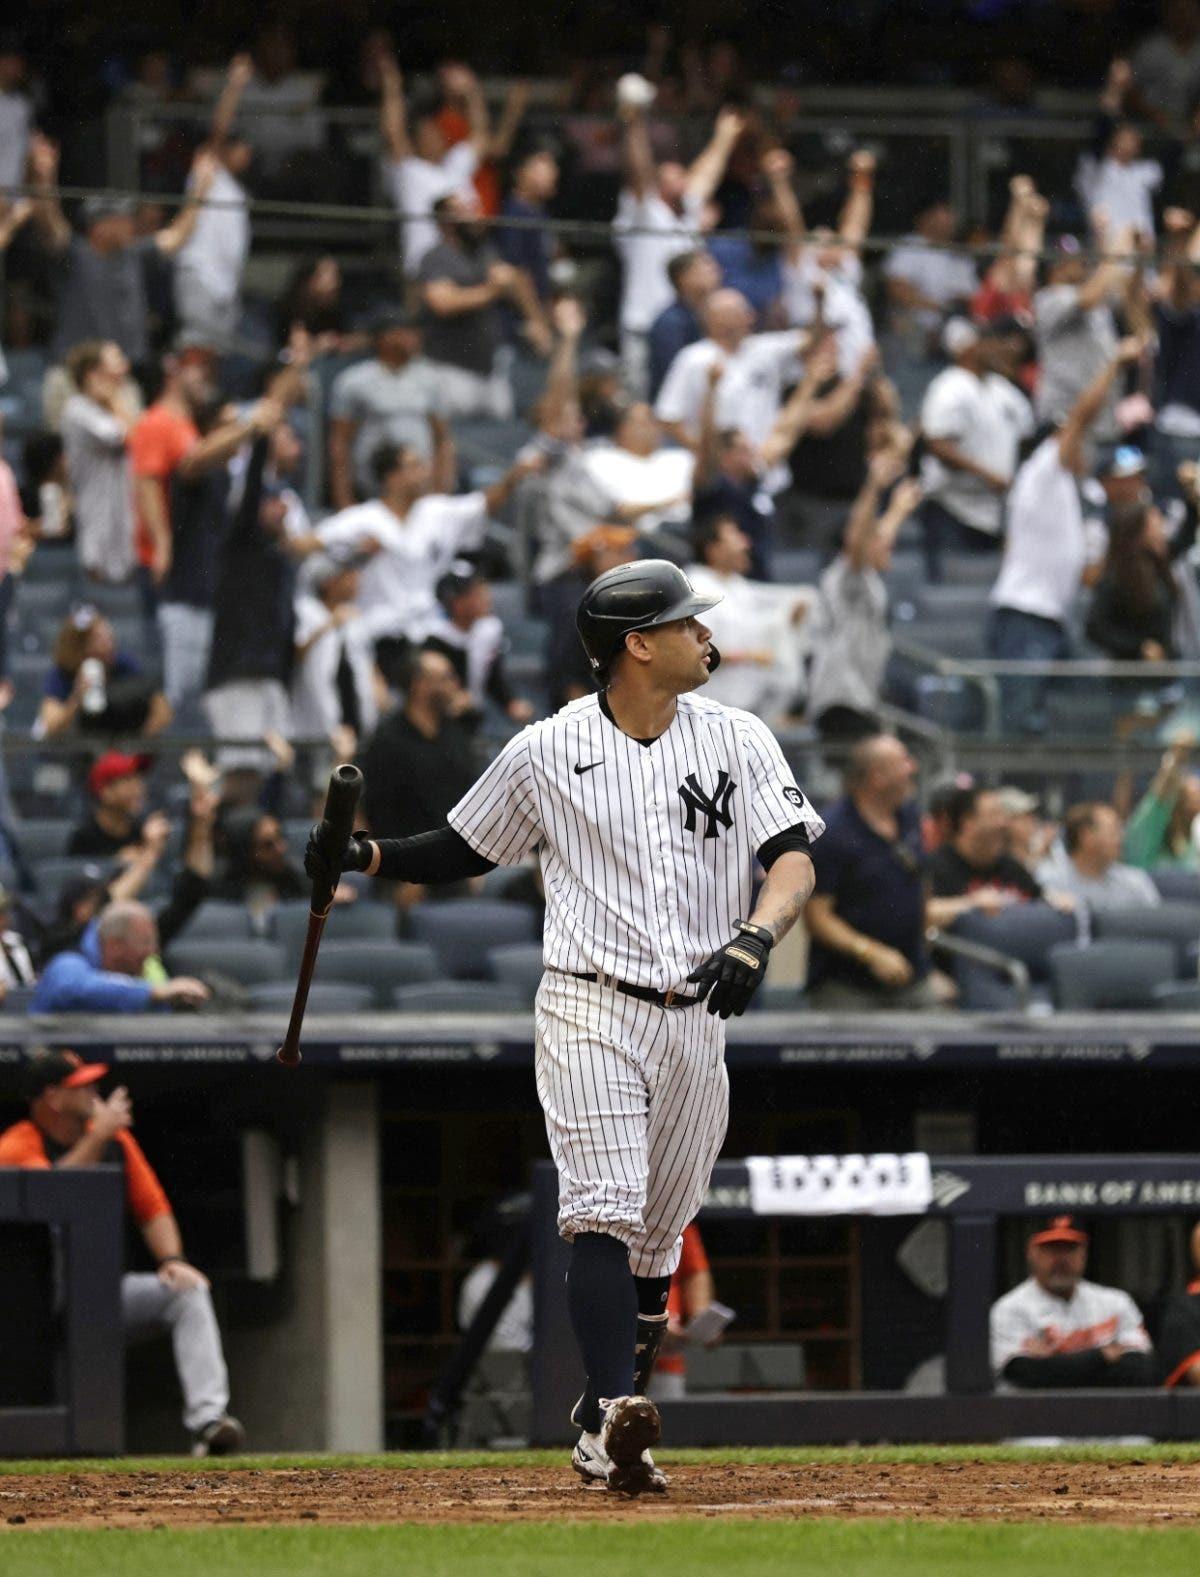 Gary Sánchez conecta jonrón con bases llenas